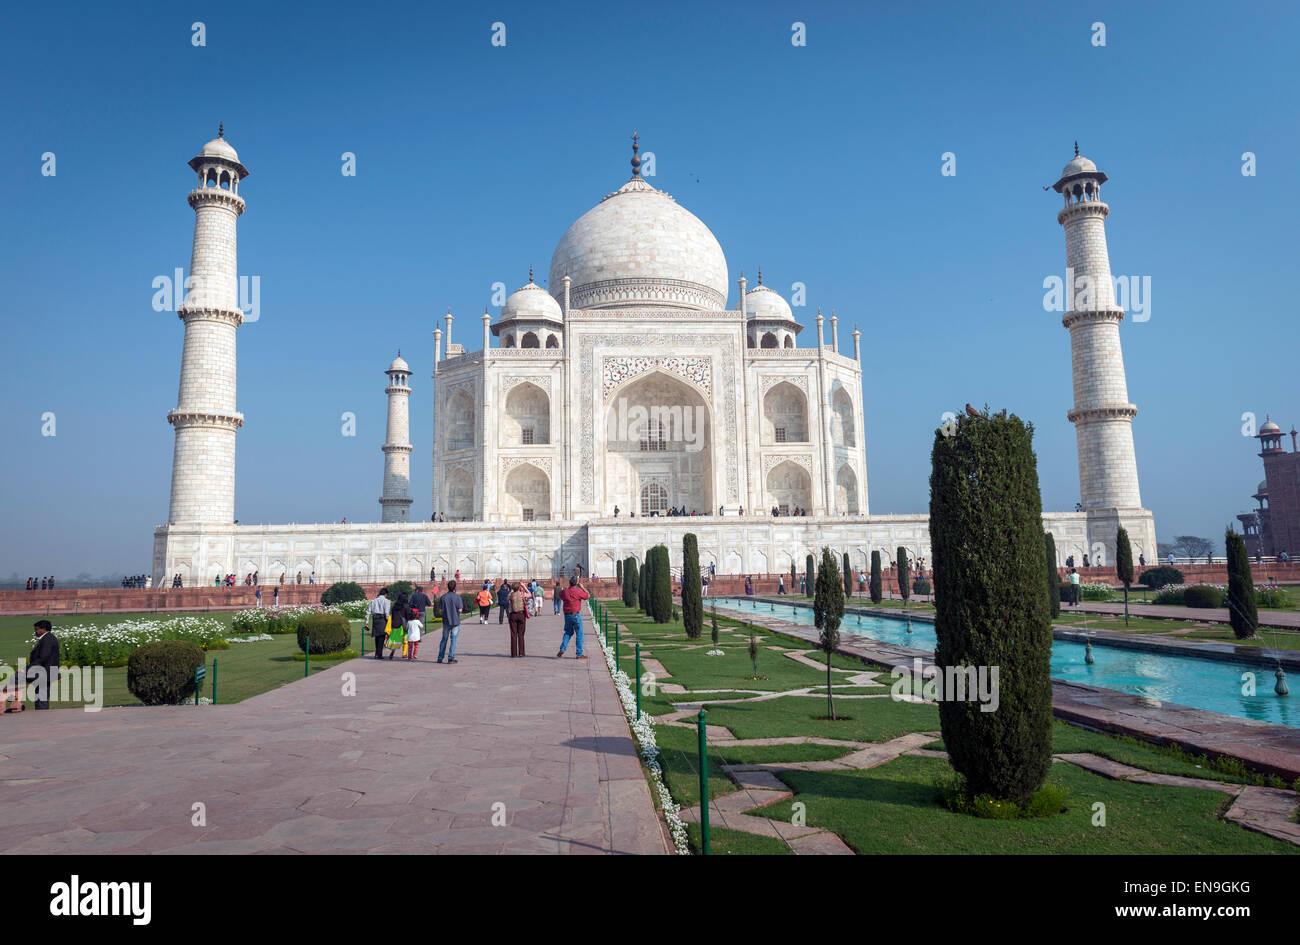 The Taj Mahal, Agra, India - Stock Image